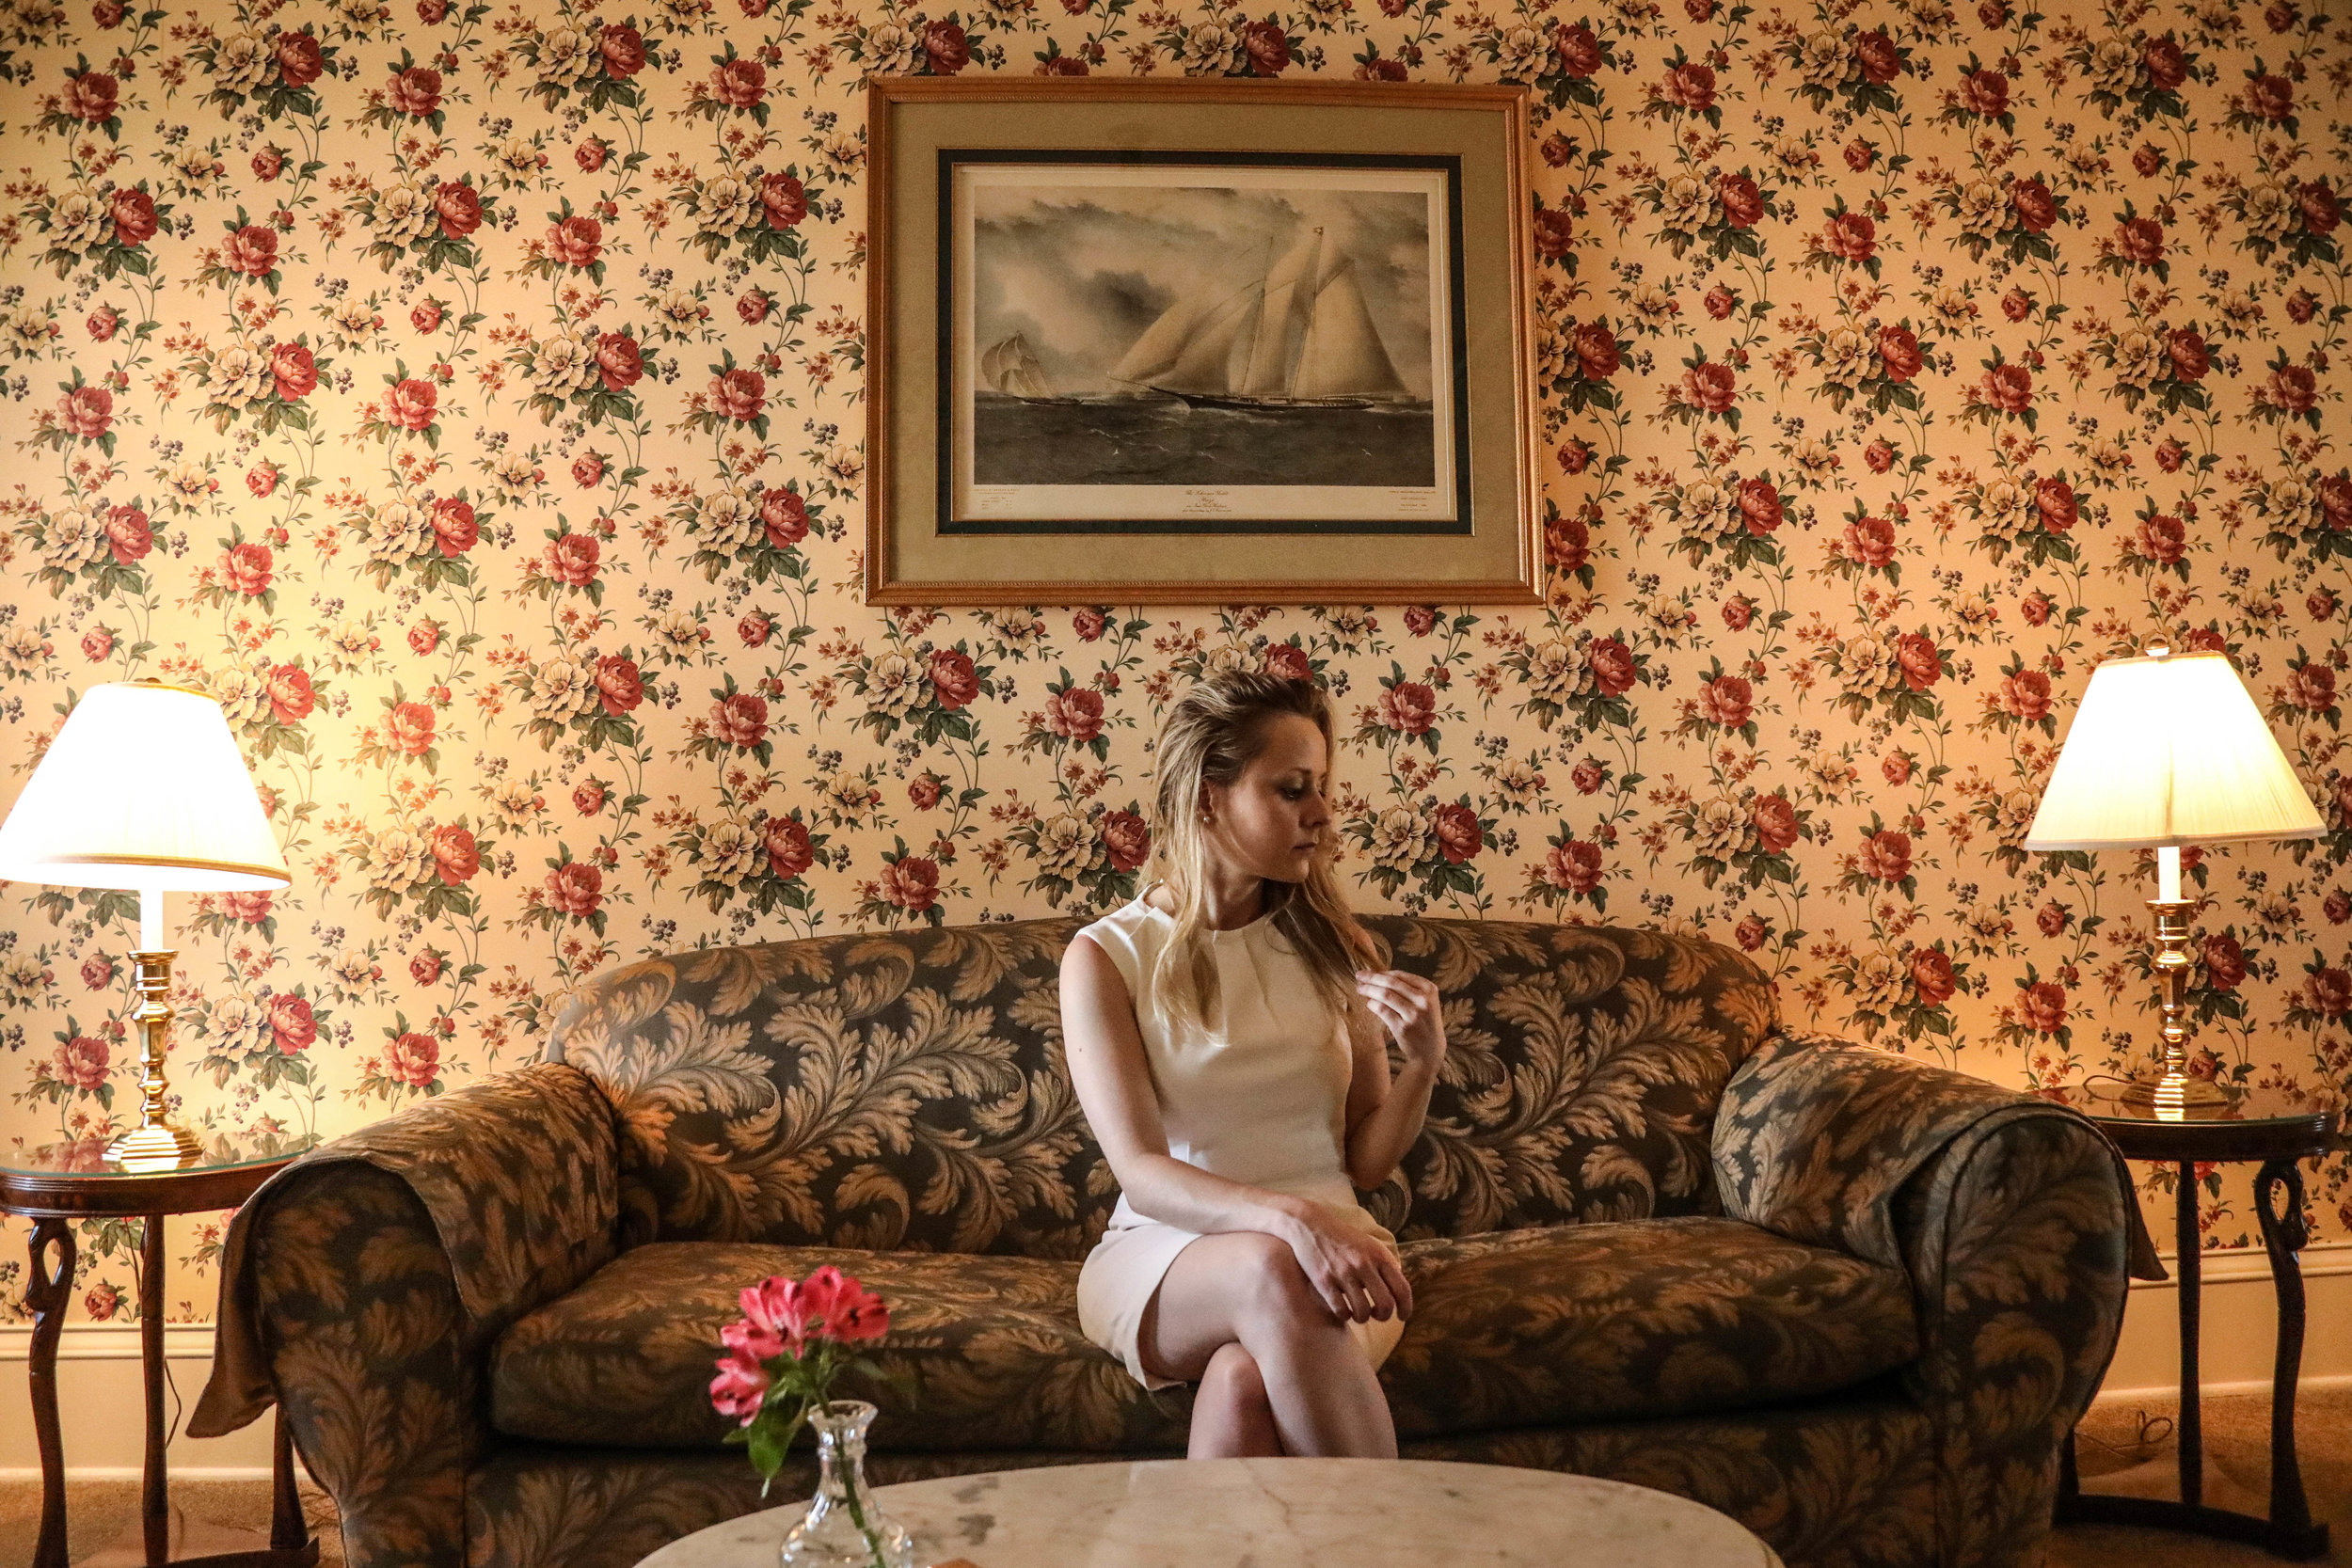 Hotel Boulderado's   Historic King Suite   features victorian-era decor throughout.